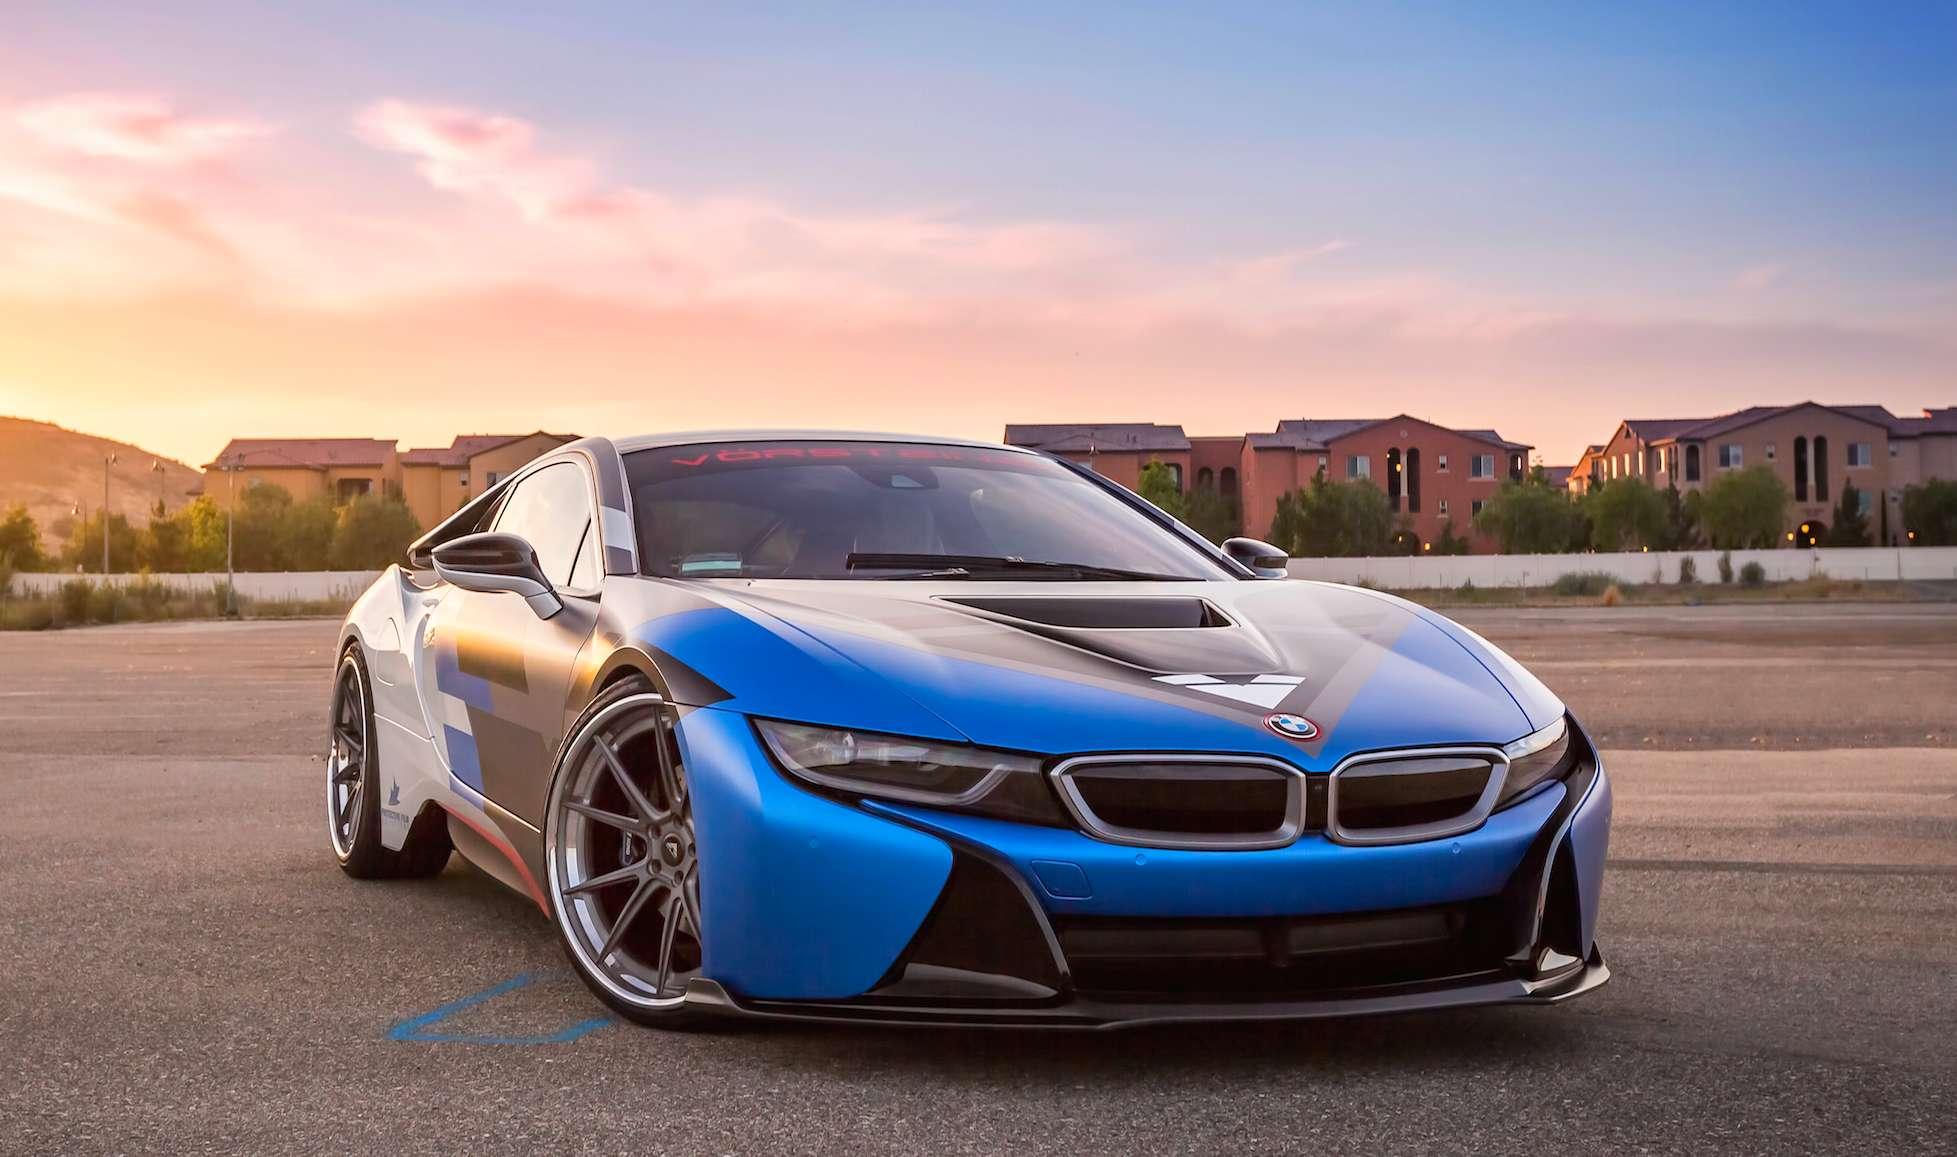 2016 Vorsteiner BMW I8 Is Ready For GoldRush Rally